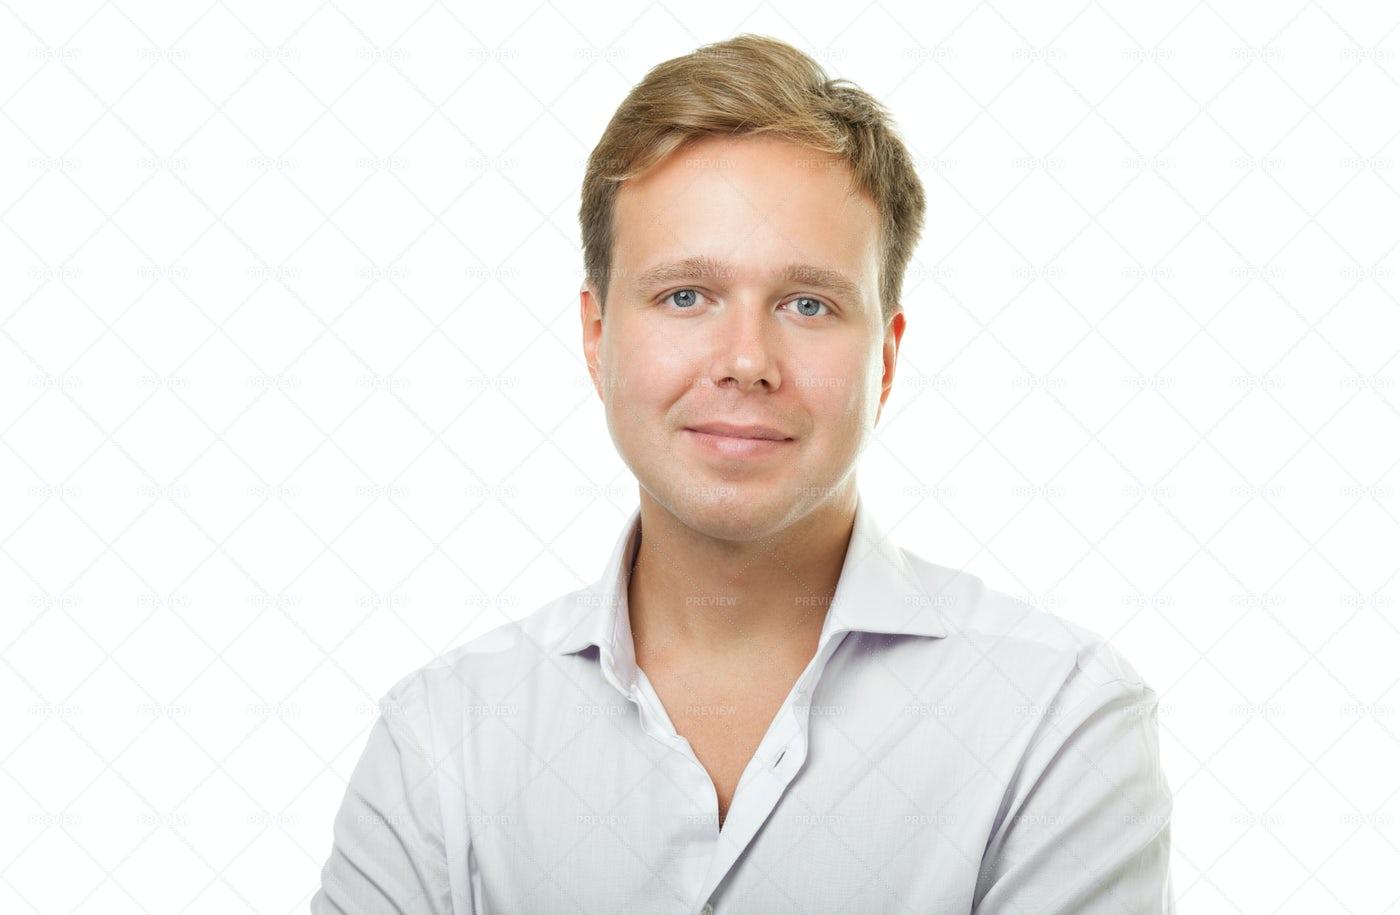 Portrait Of Blonde Man: Stock Photos